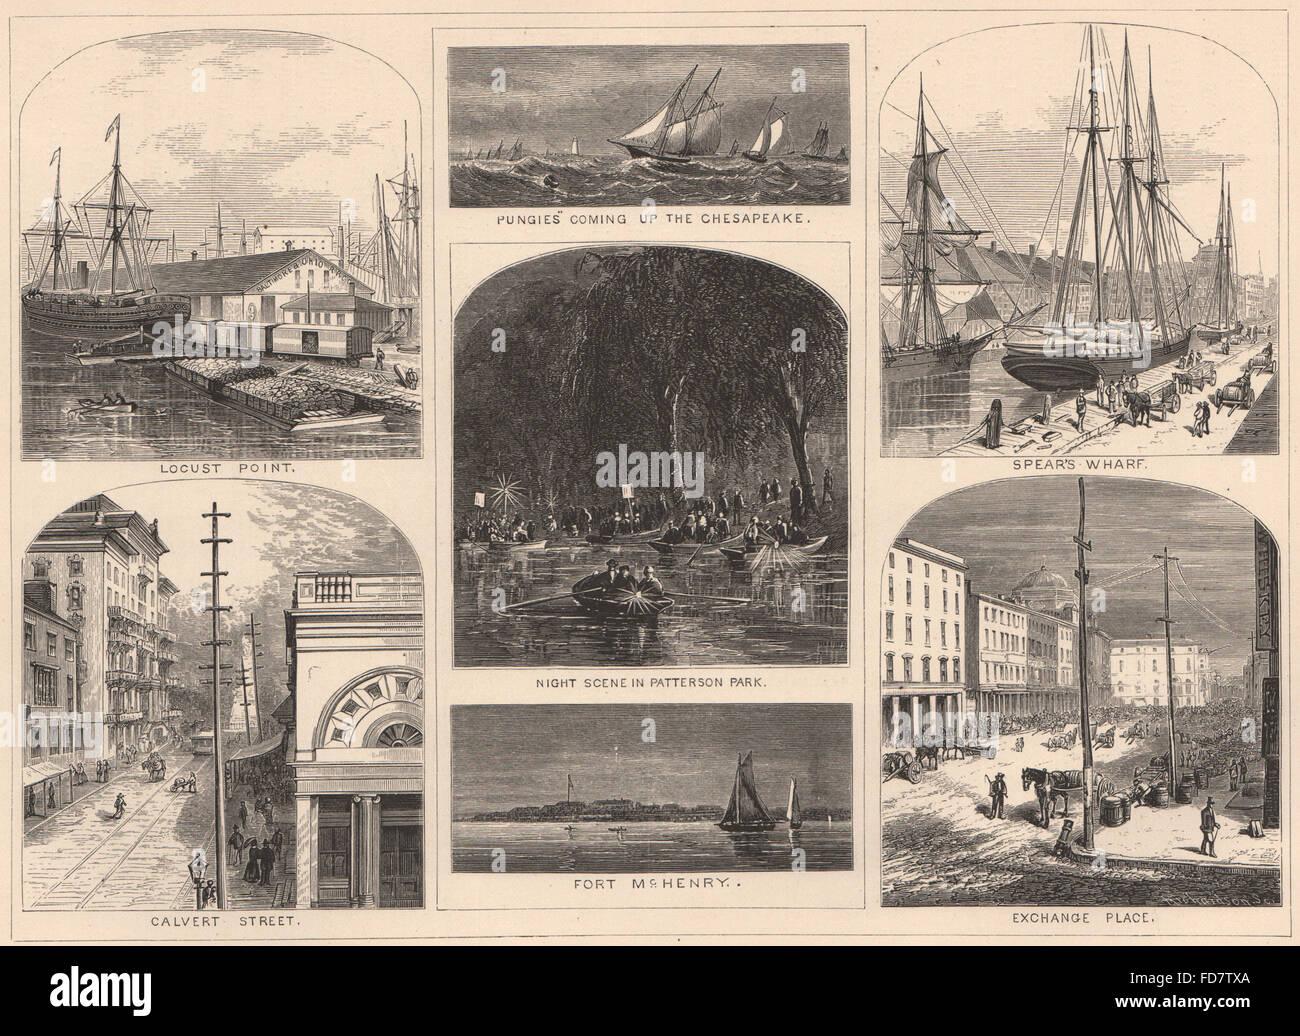 BALTIMORE:Pungies Ft McHenry Locust Pt Calvert St Spear's Wharf Exchange Pl 1874 - Stock Image